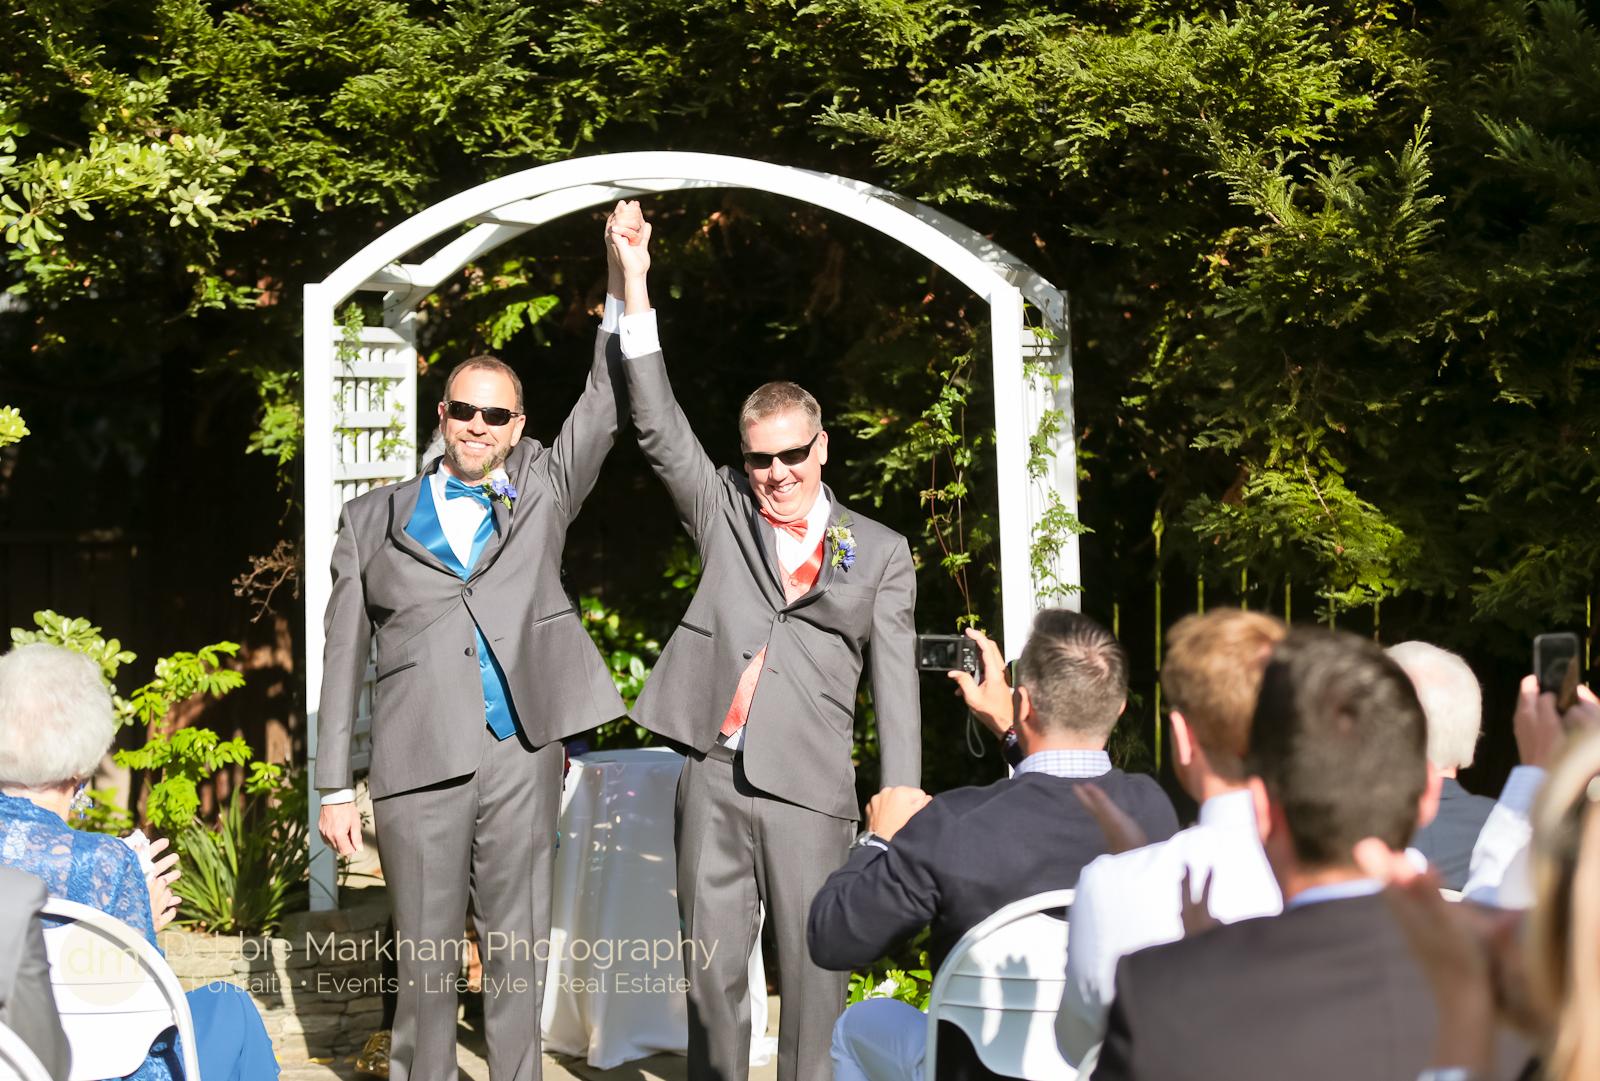 Tony and Scott Cambria Pines Lodge Garden Wedding _Cambria_Destination_Gay Wedding_Wedding Photographer_Debbie Markham_gay_lgbt